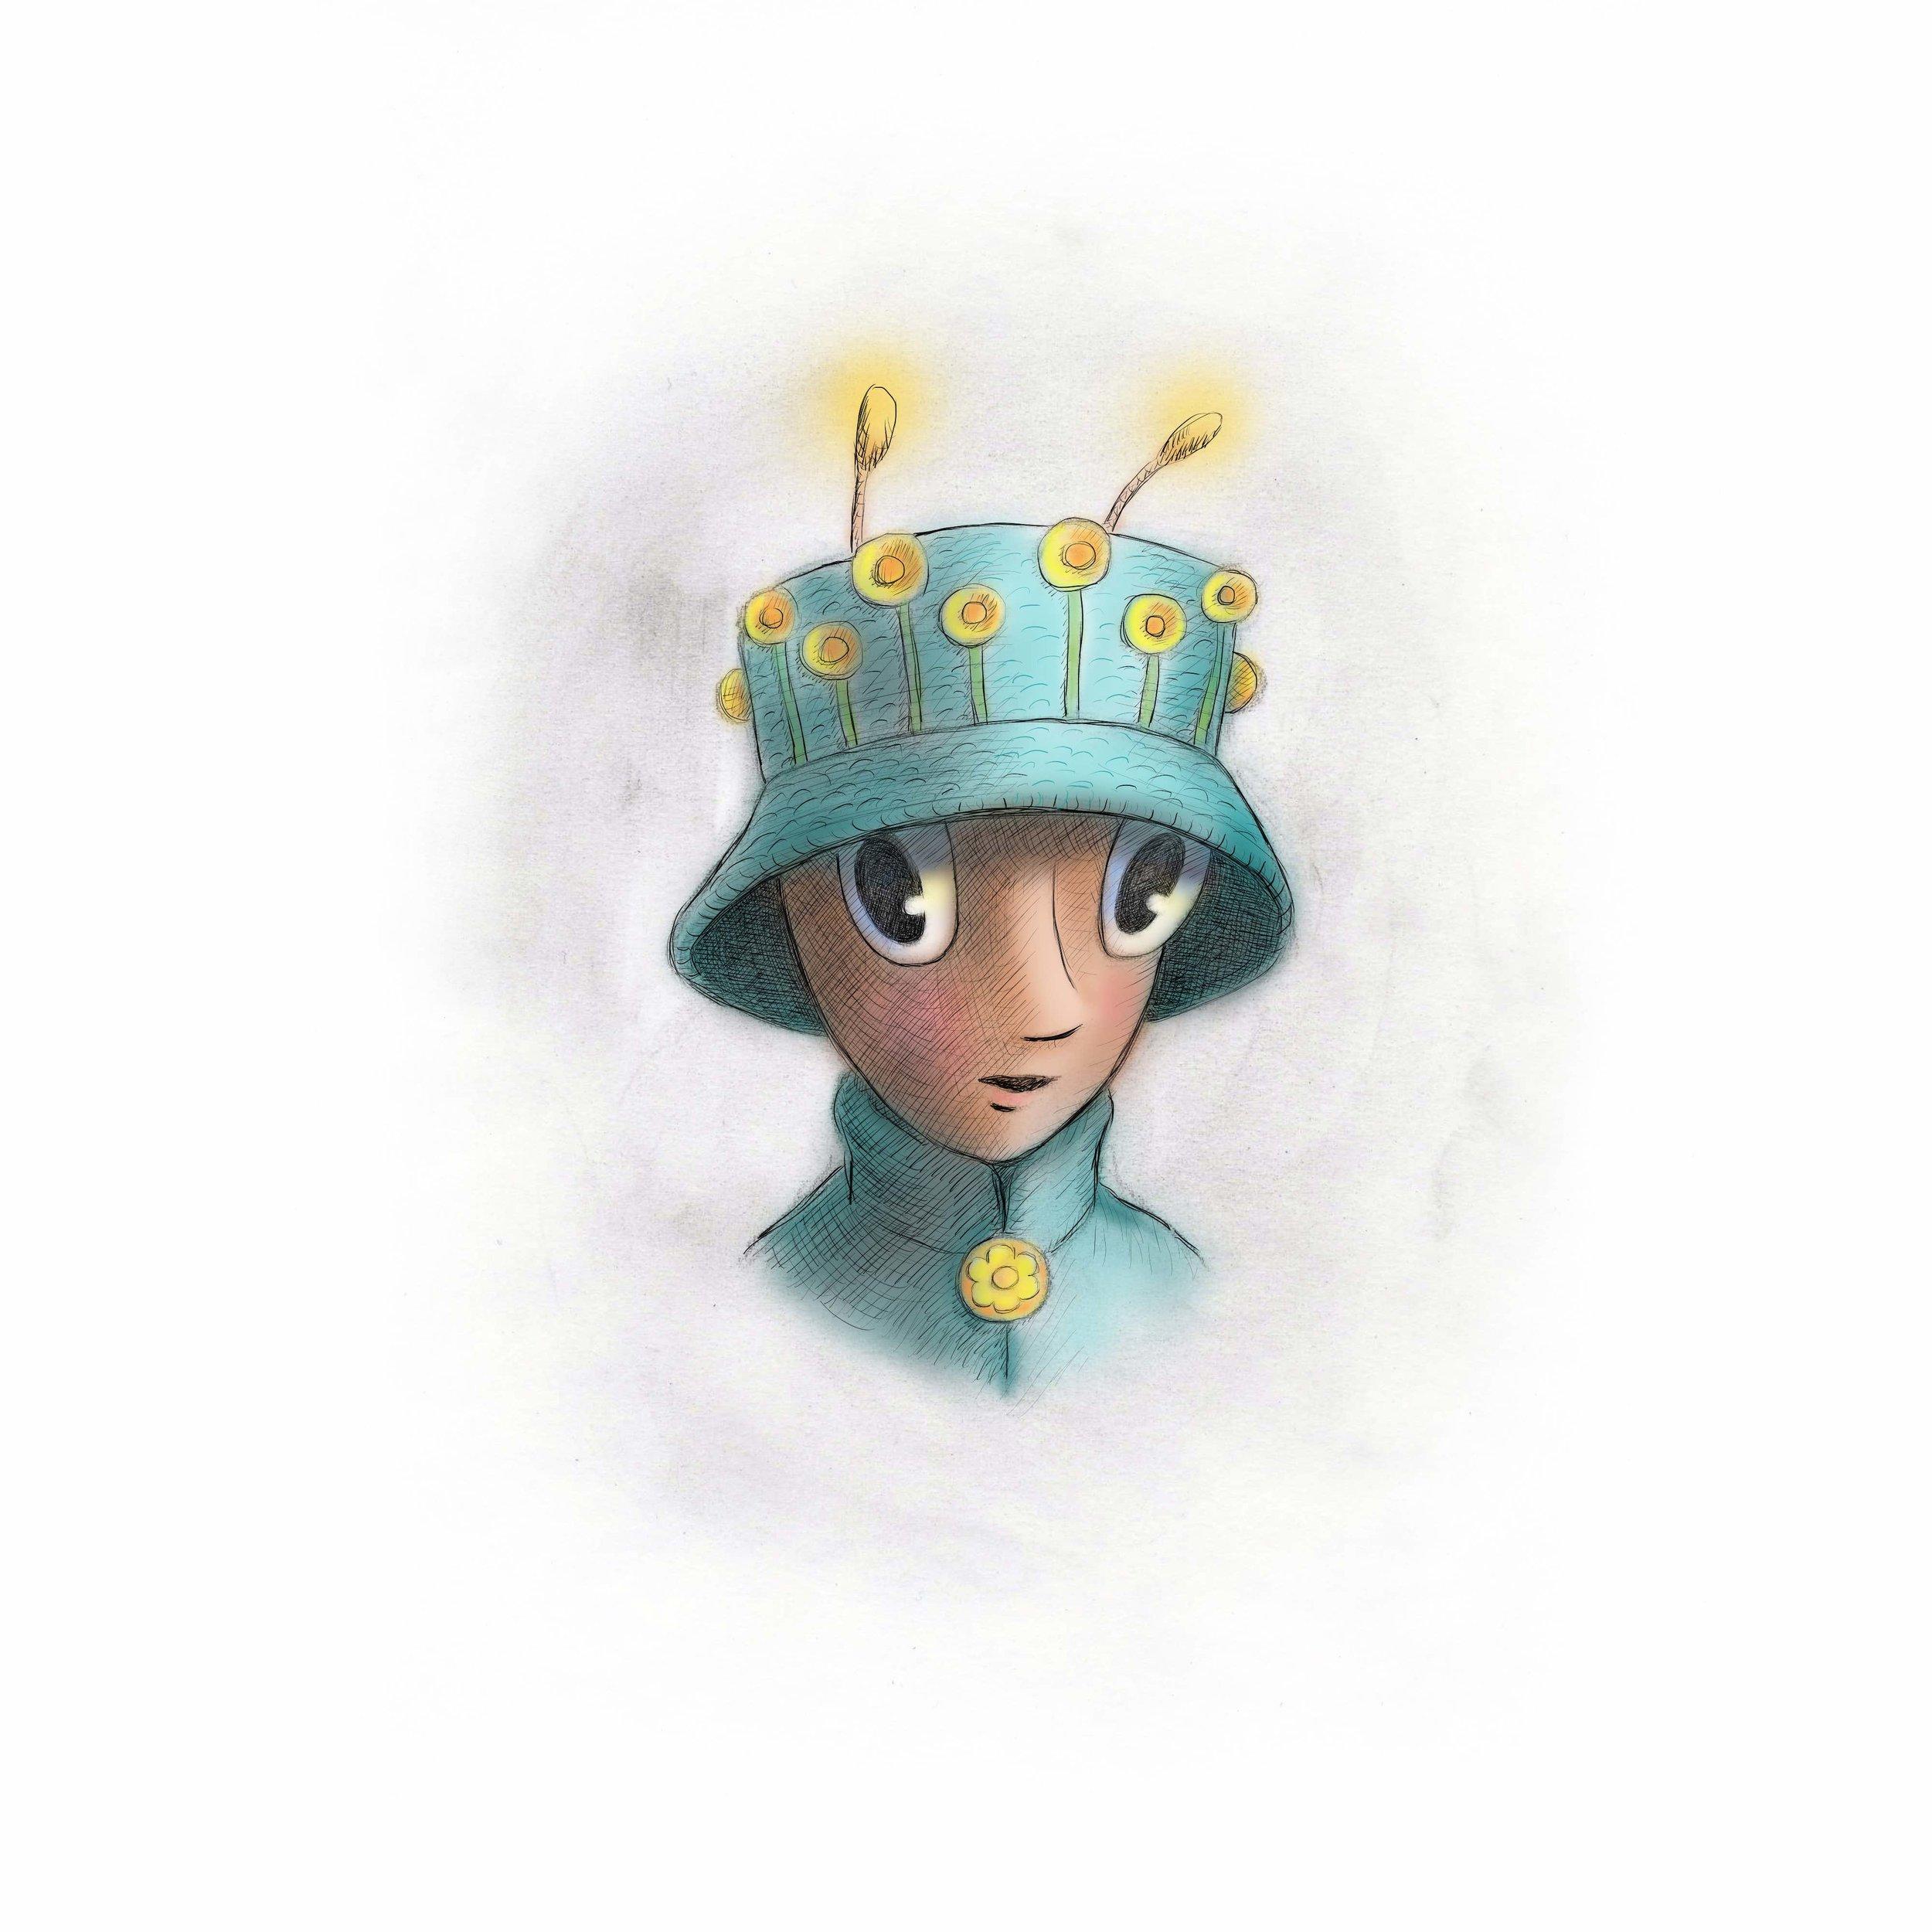 fashion bug with hat 9.jpeg